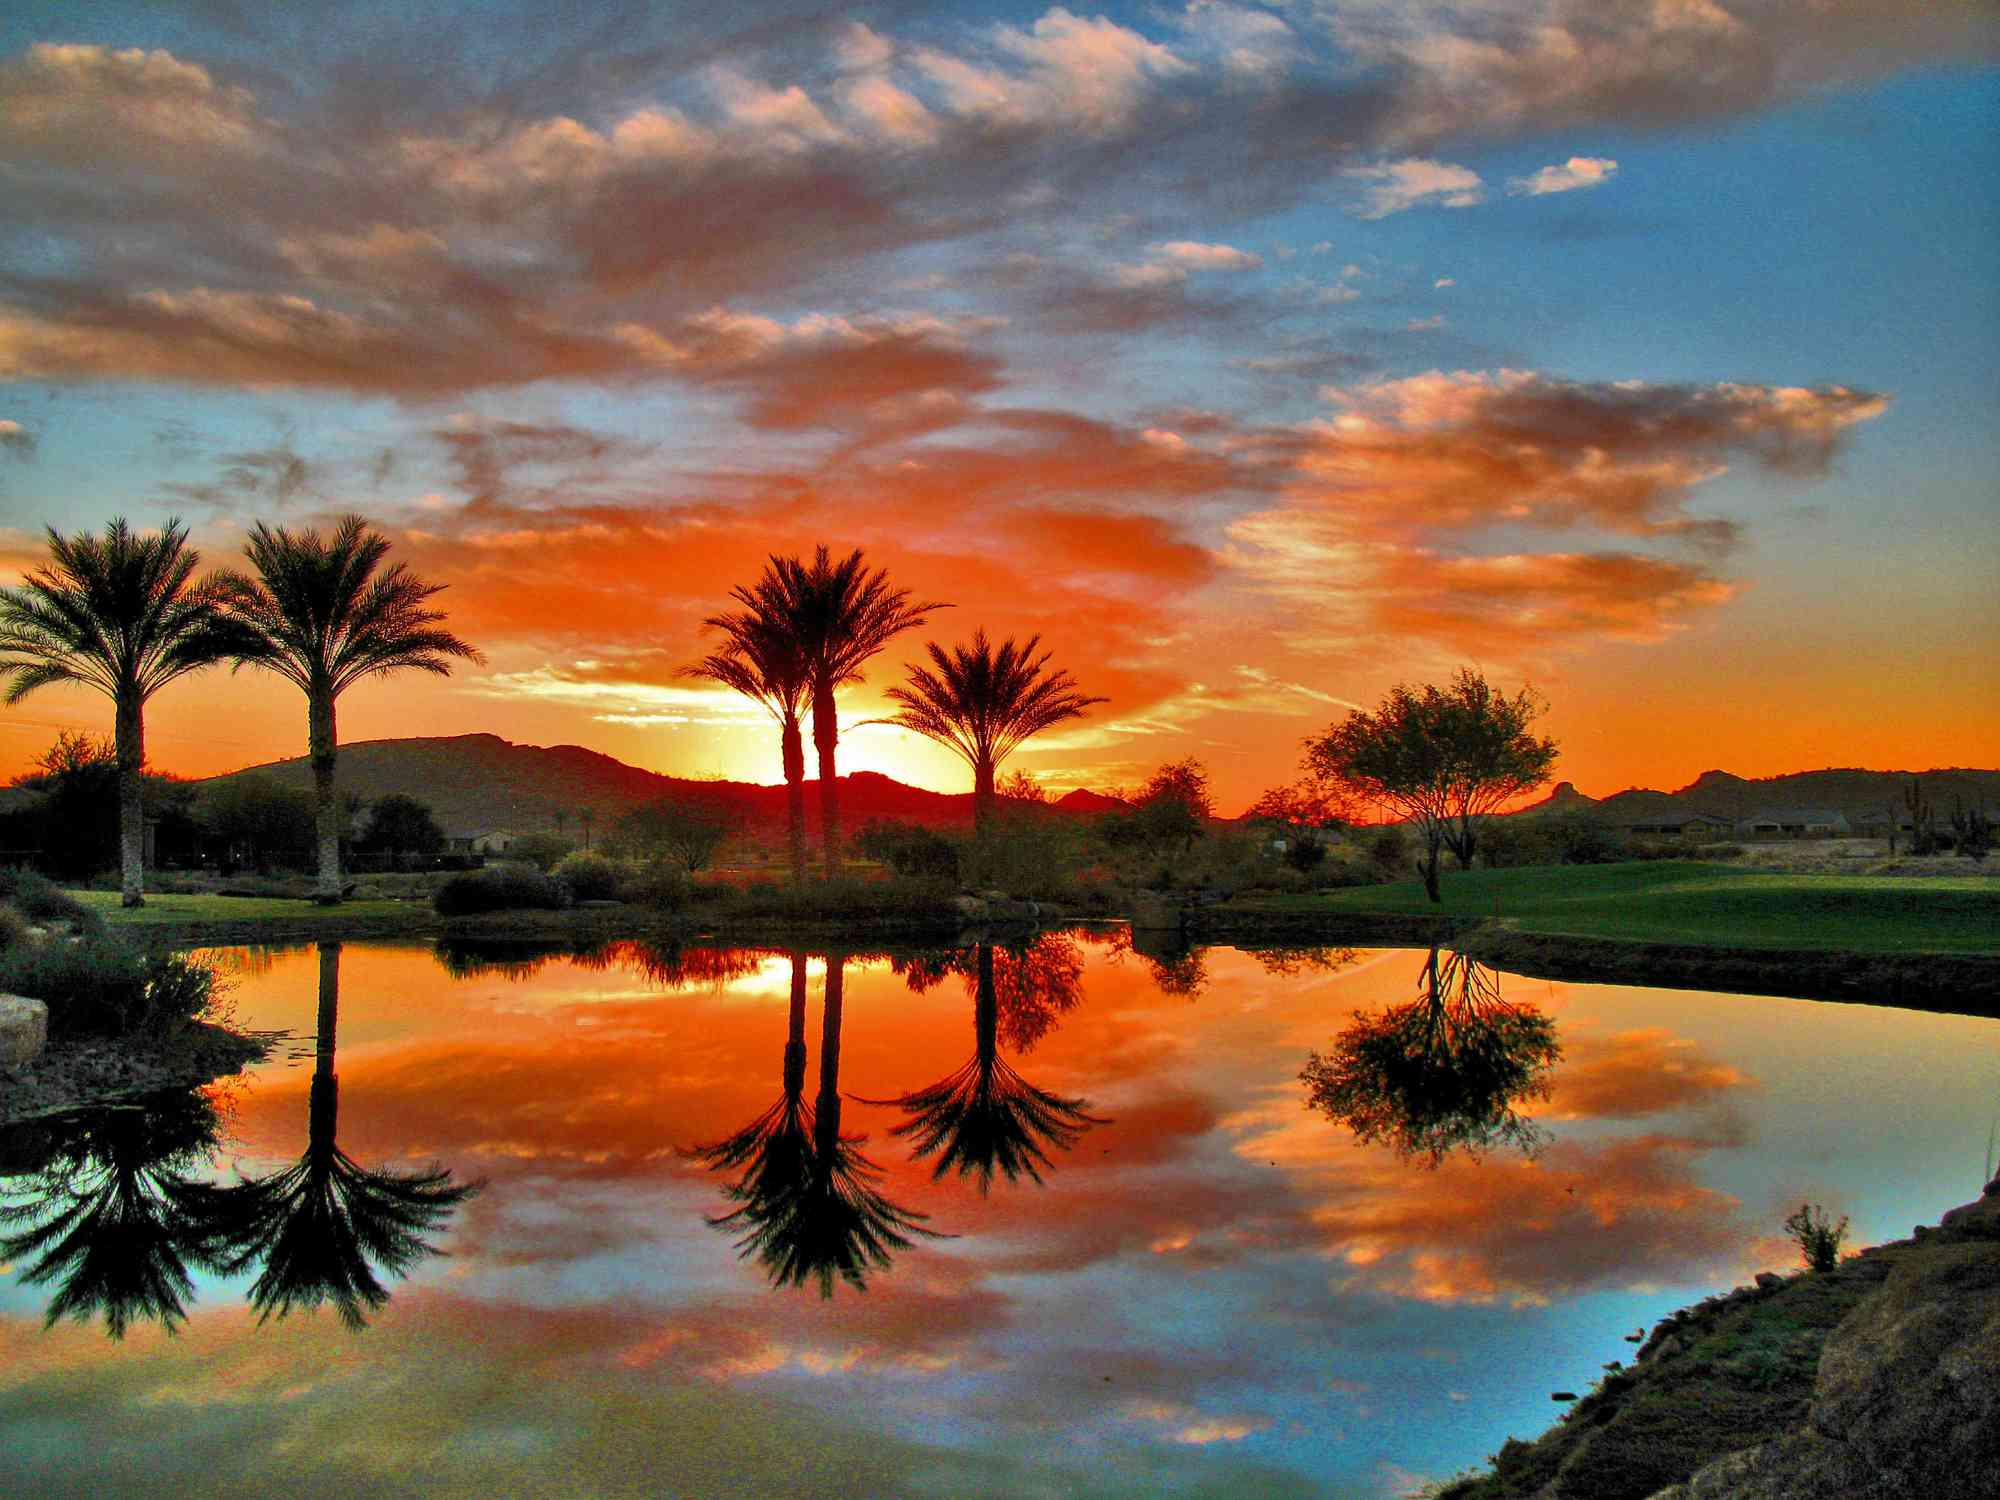 Peoria, AZ, United States